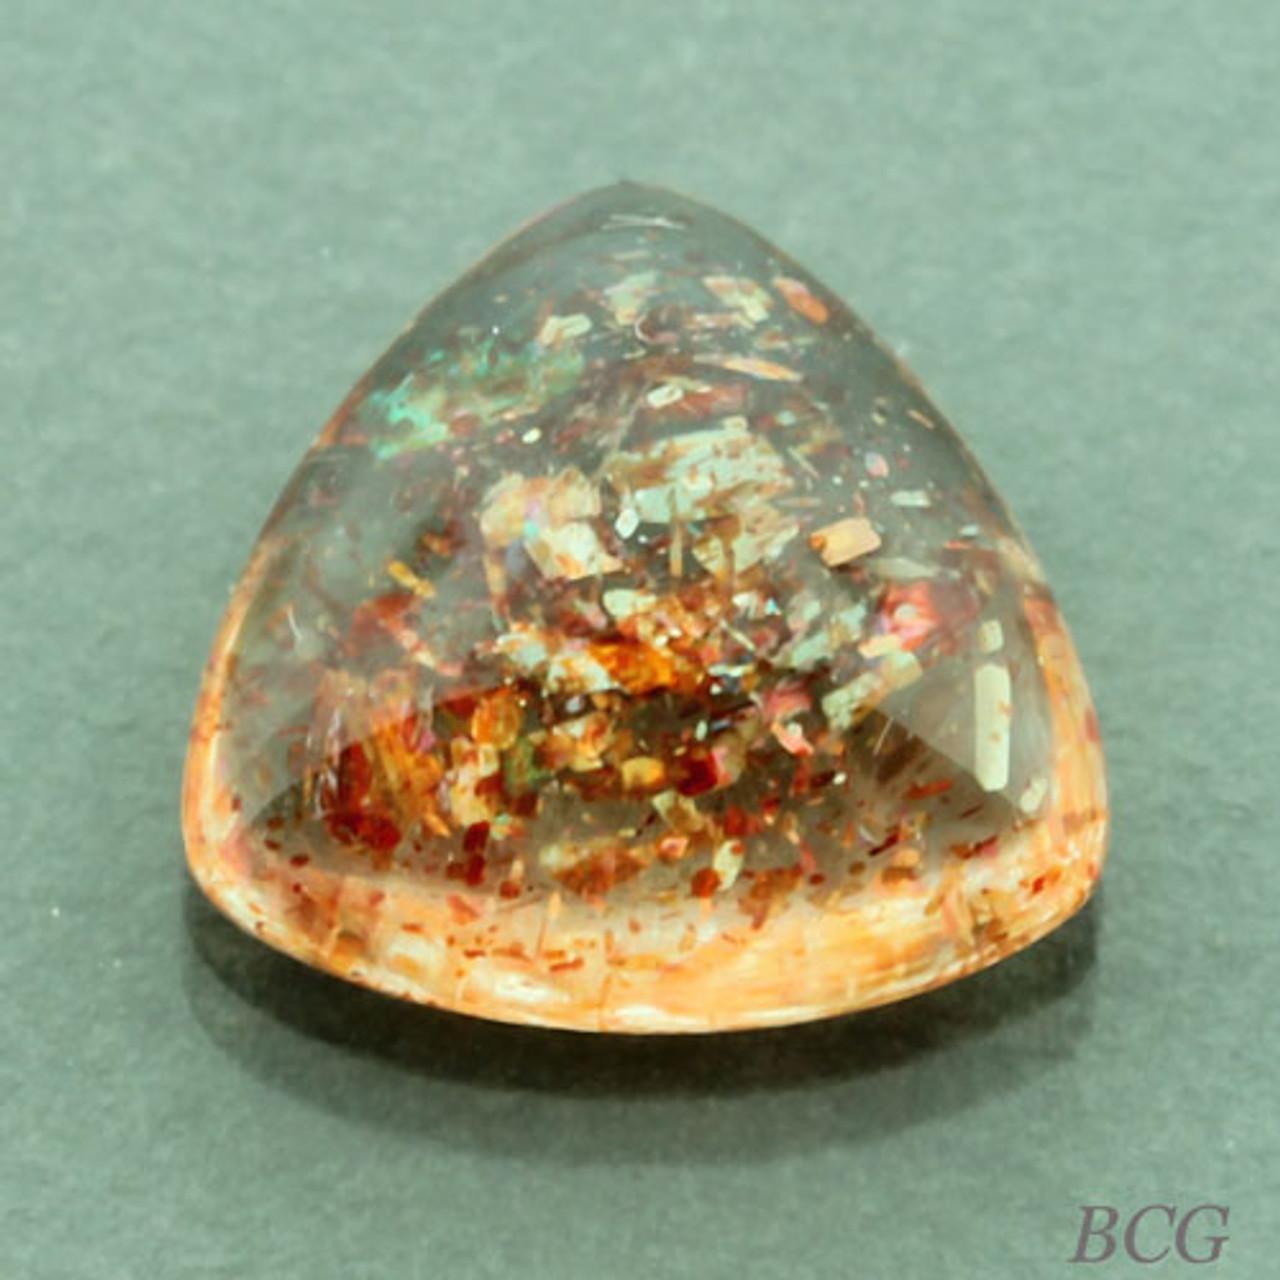 11 Cts Top Quality Sunstone gemstone Very Smooth Natural Sunstone Cabochon One Side Polished Sunstone Oval Shape Loose Gemstone TG 13